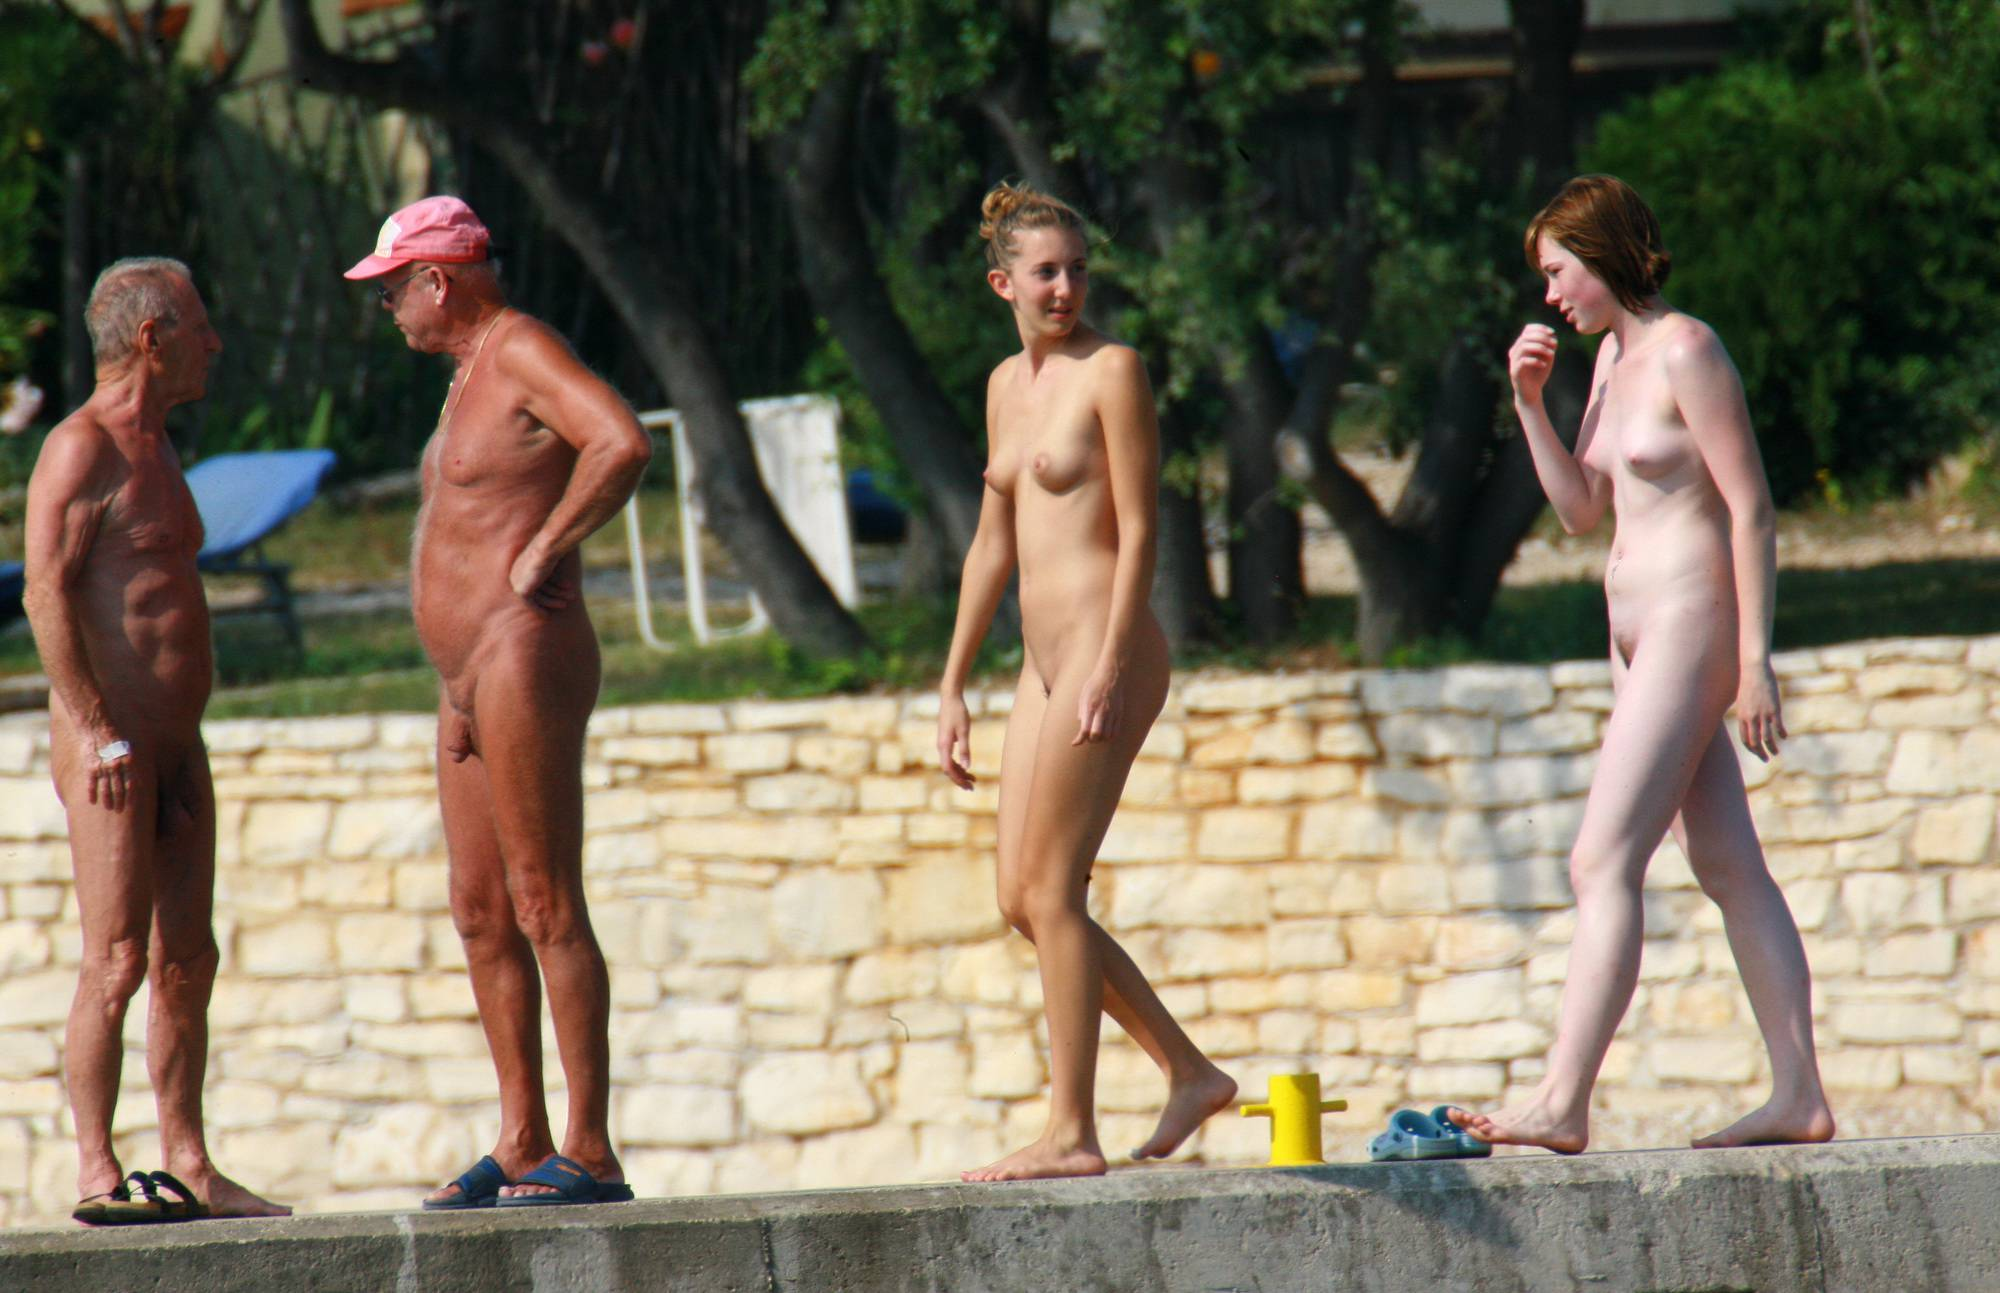 Purenudism Images-Nude Duet On-Water Slab - 2